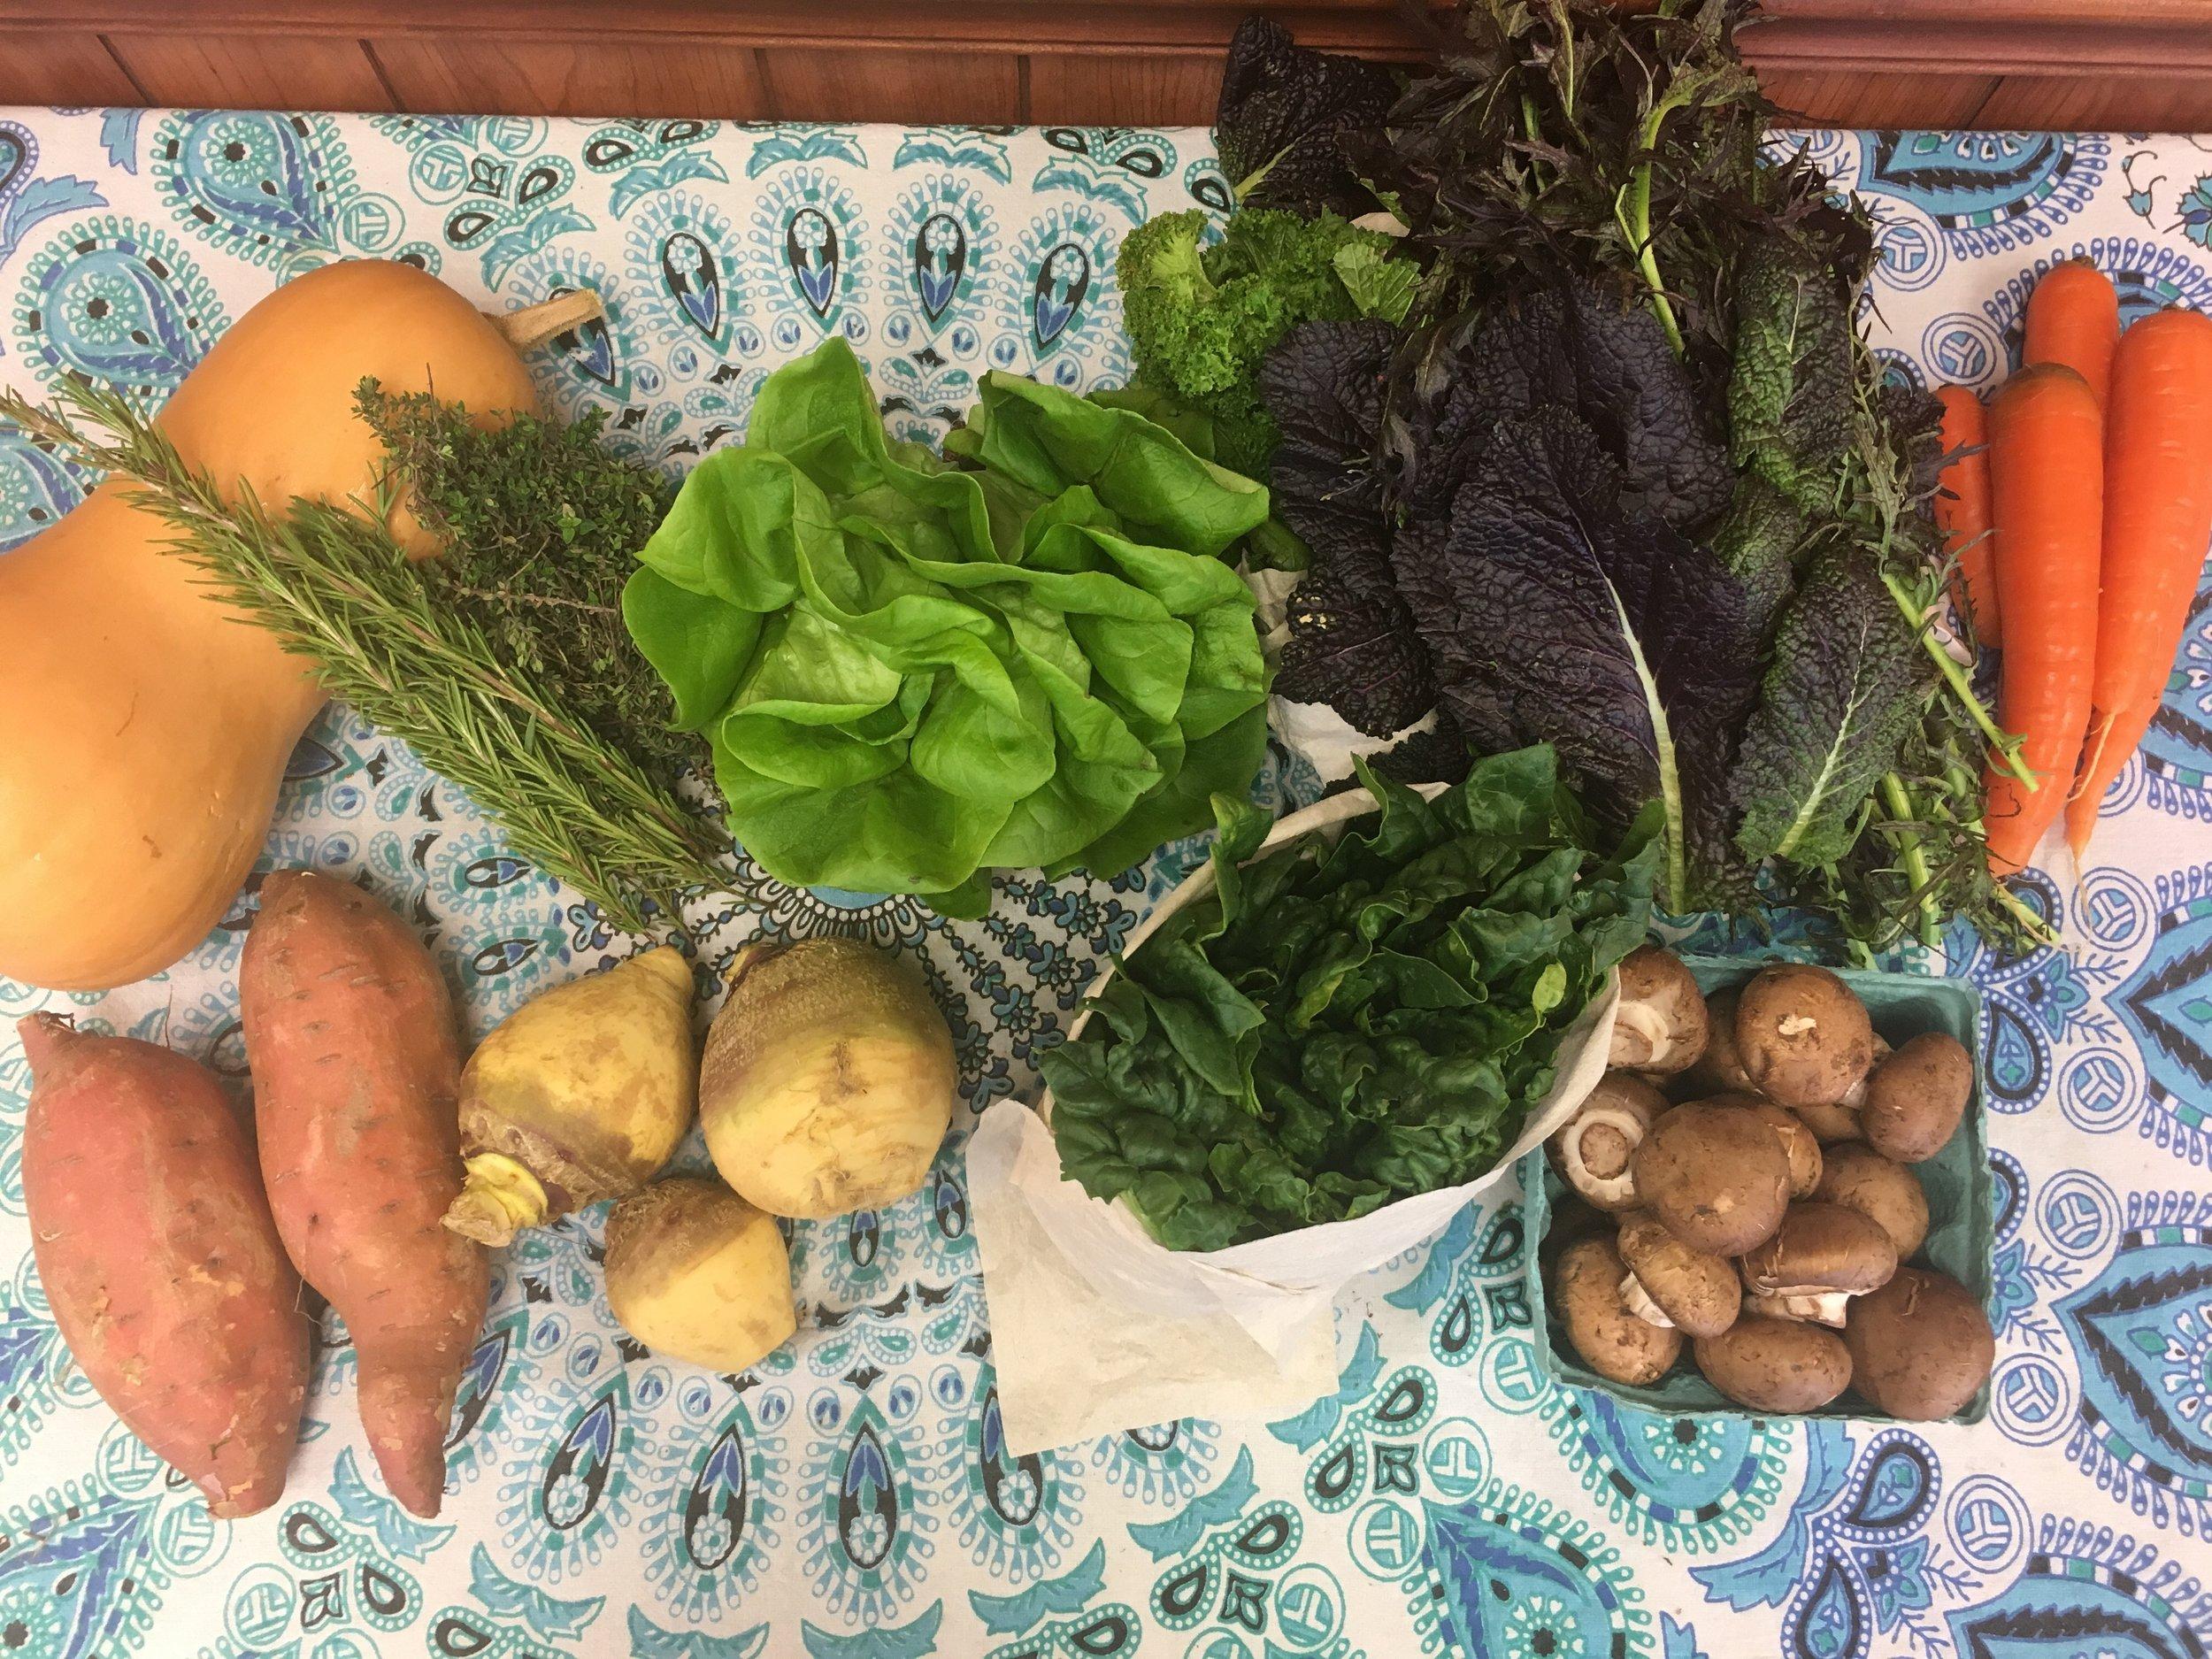 Spice of Life small- butternut squash, herbs, Bibb lettuce, mixed mustard greens, carrots, garnet sweet potatoes, rutabaga, spinach, and cremini mushrooms.